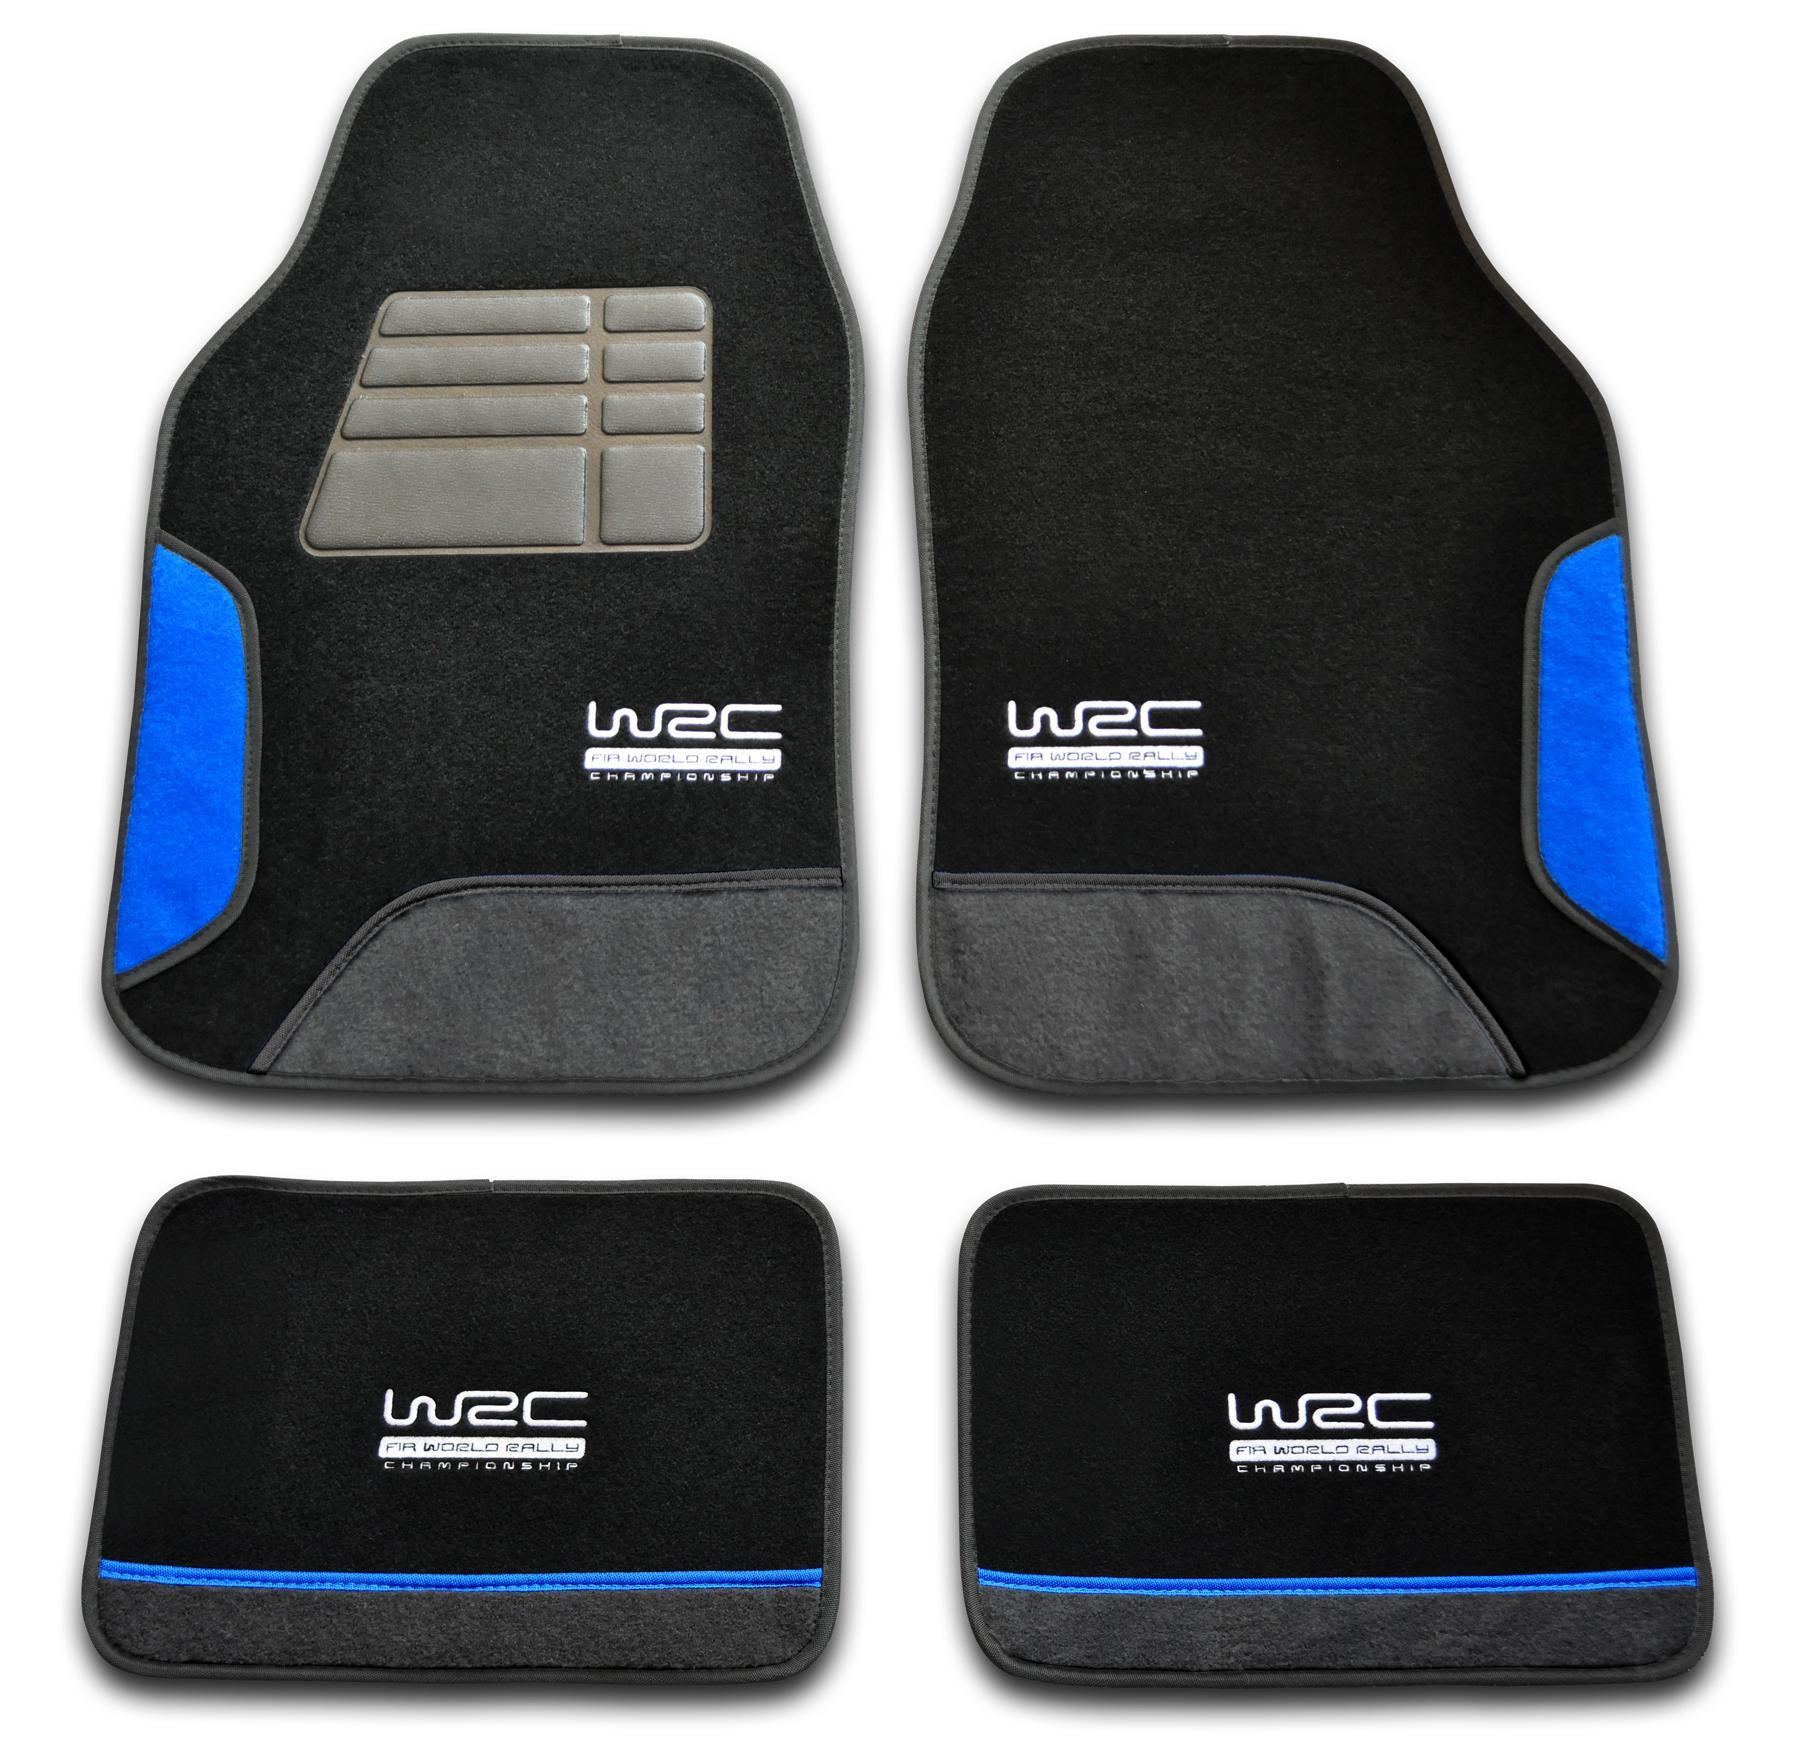 007436 Vloermatset WRC originele kwaliteit